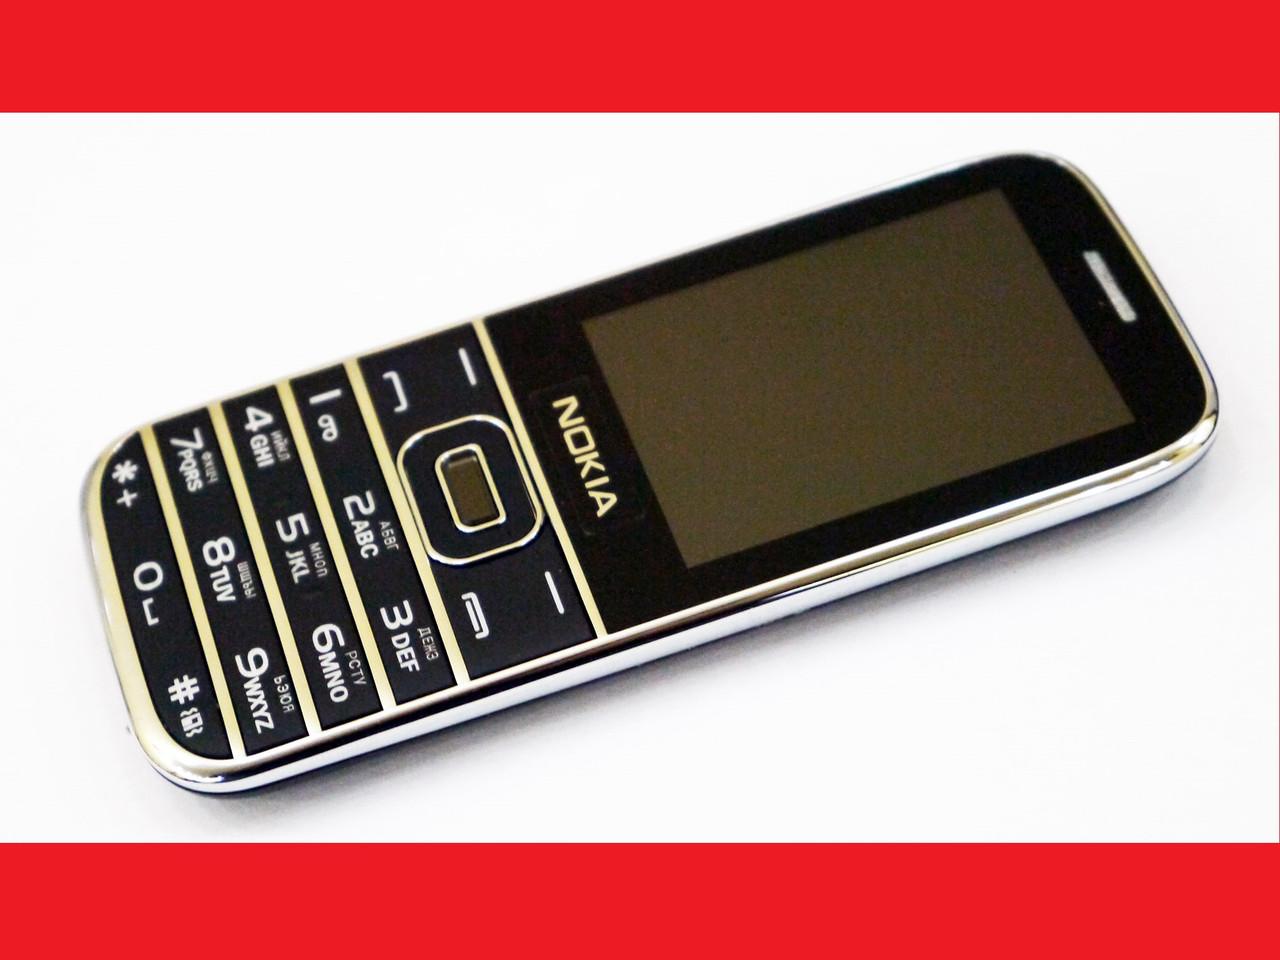 Телефон Nokia G809 Black - 2Sim+2,4''+FM